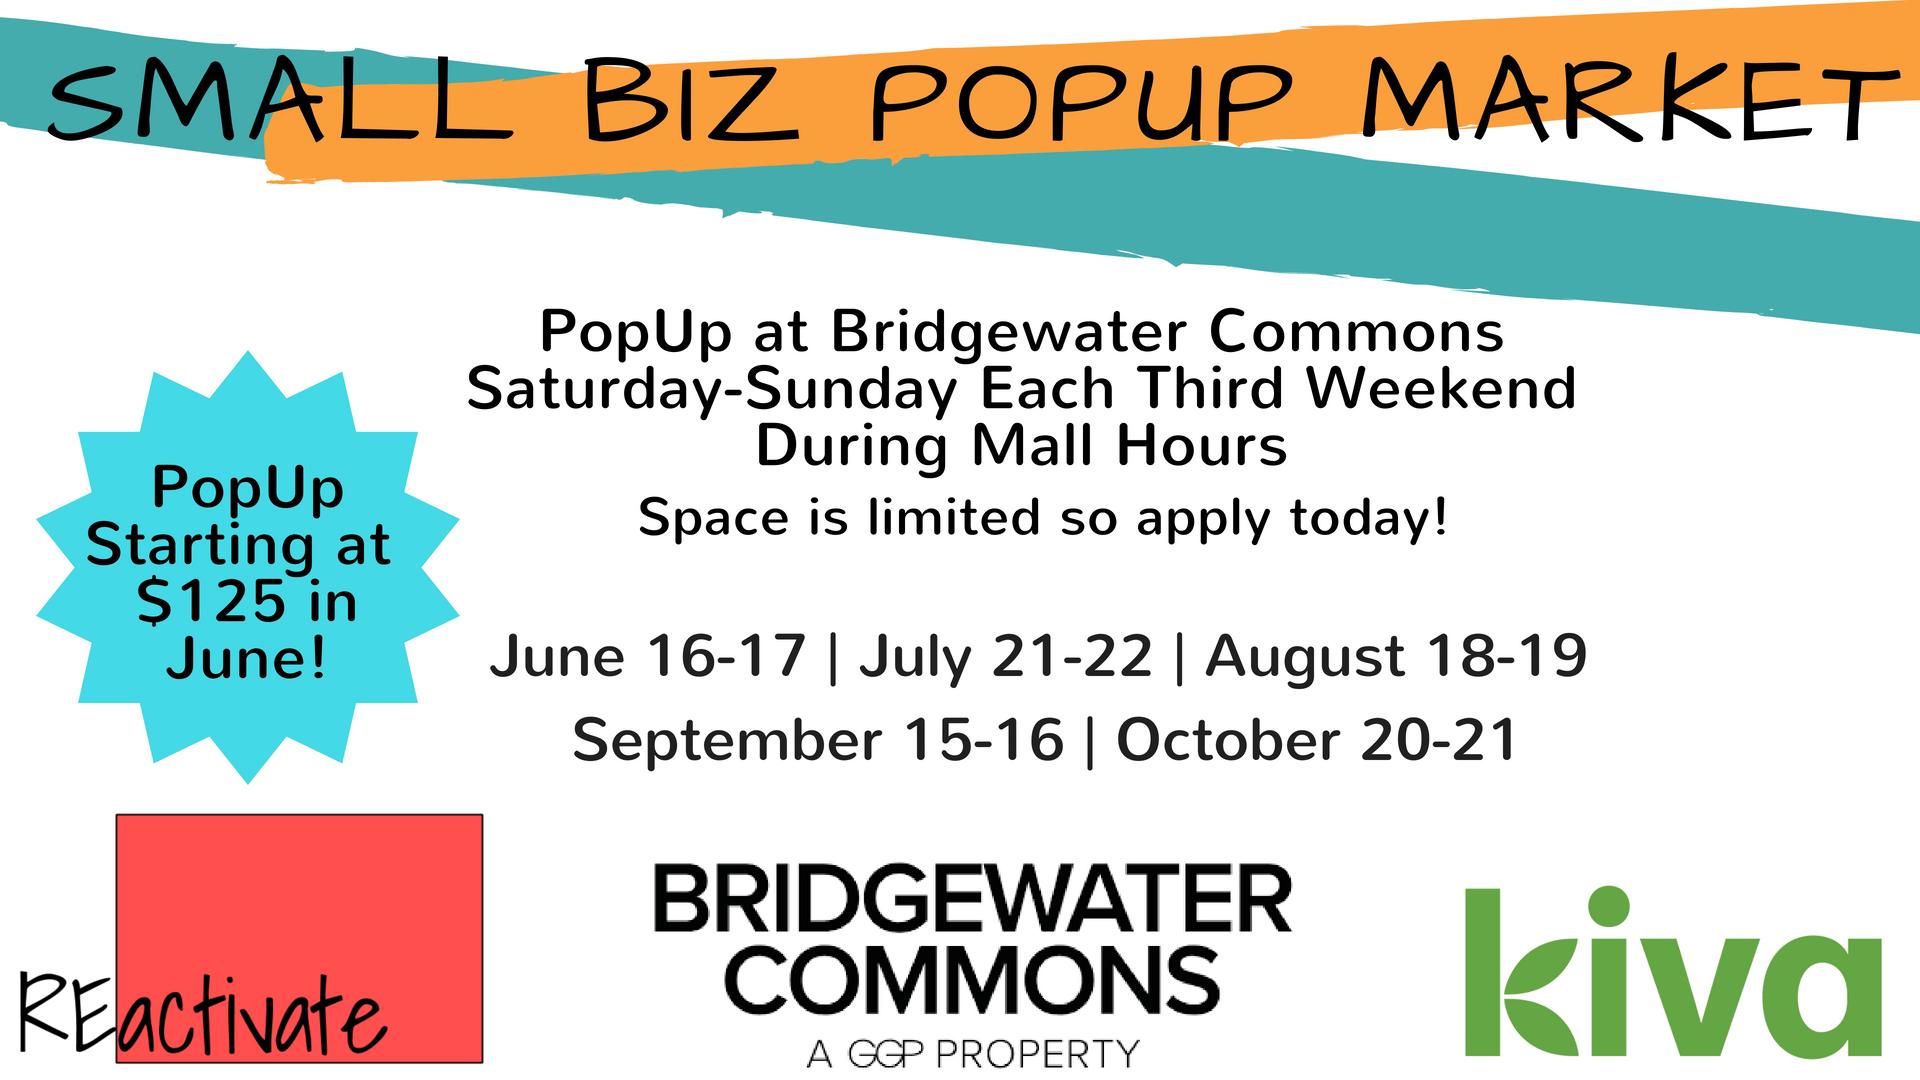 Vendor Opportunity! Small Biz PopUp Market @